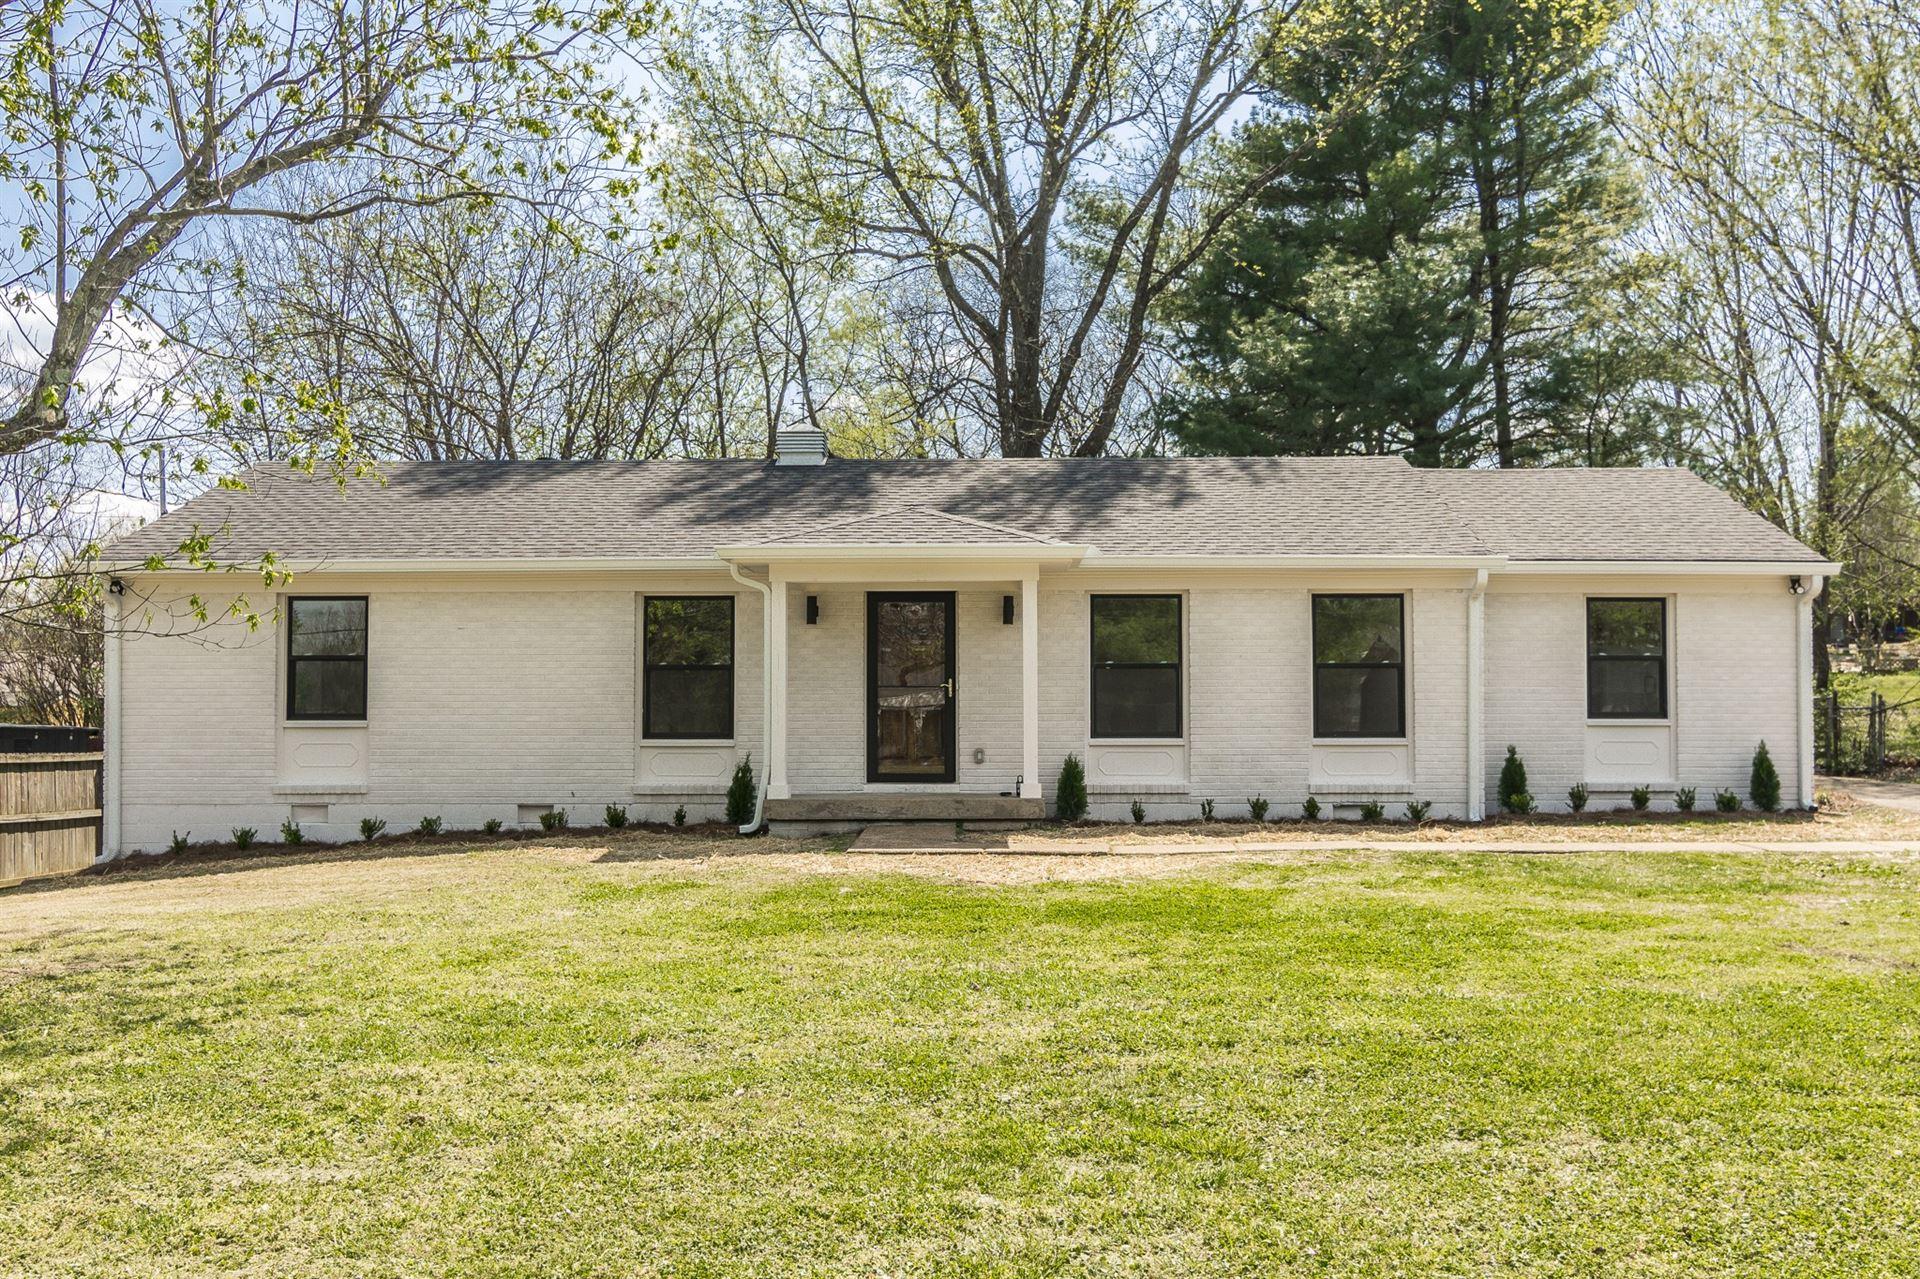 355 Binkley Dr, Nashville, TN 37211 - MLS#: 2242360